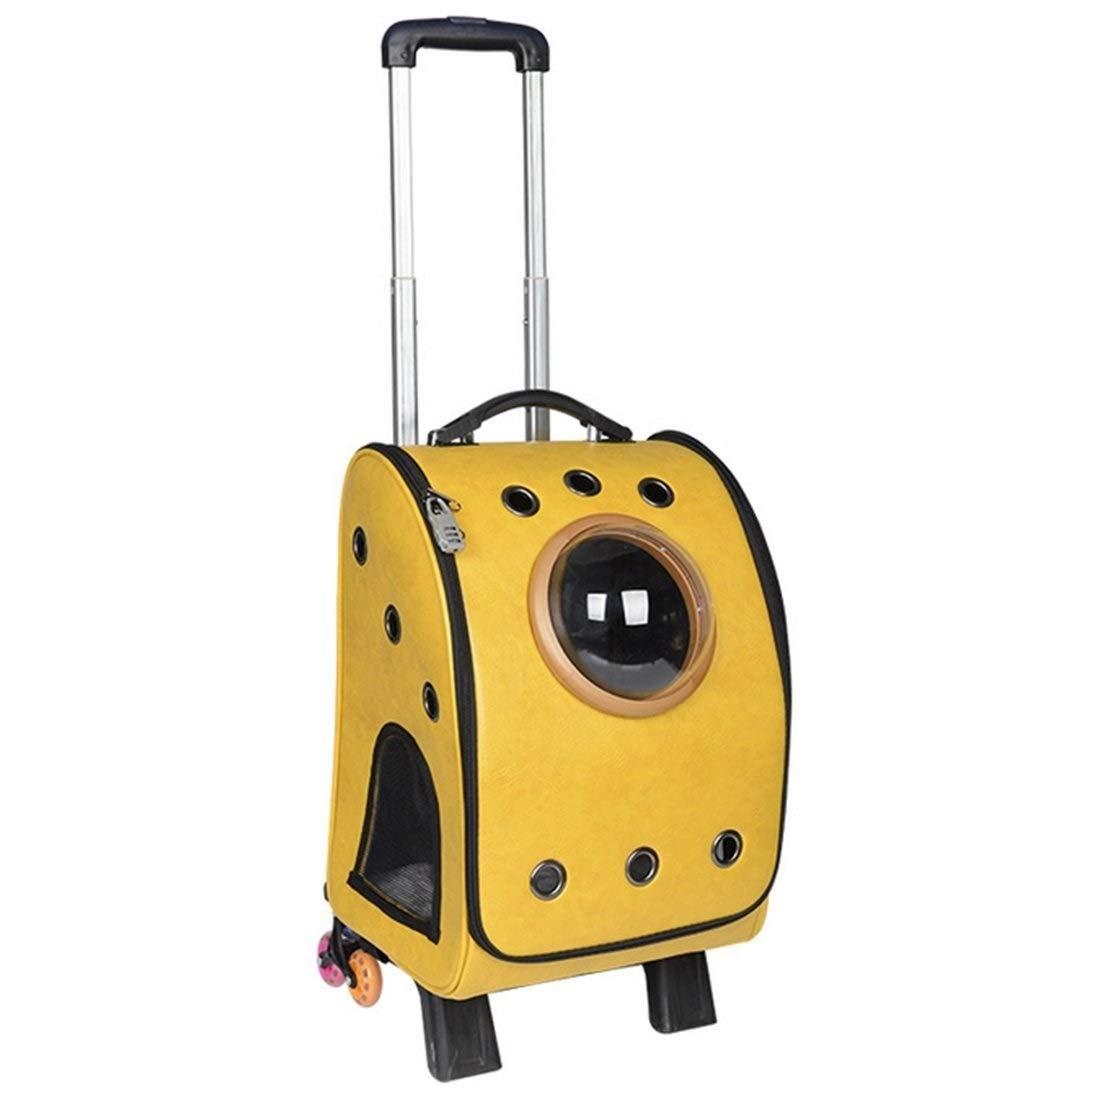 Eroscat ペットポータブルキャリアスペースカプセルバックパック、ペットバブルトラベラーナップザック複数の通気孔防水軽量ハンドバッグ猫用小型犬&小柄な動物 (Color : 黄) 黄